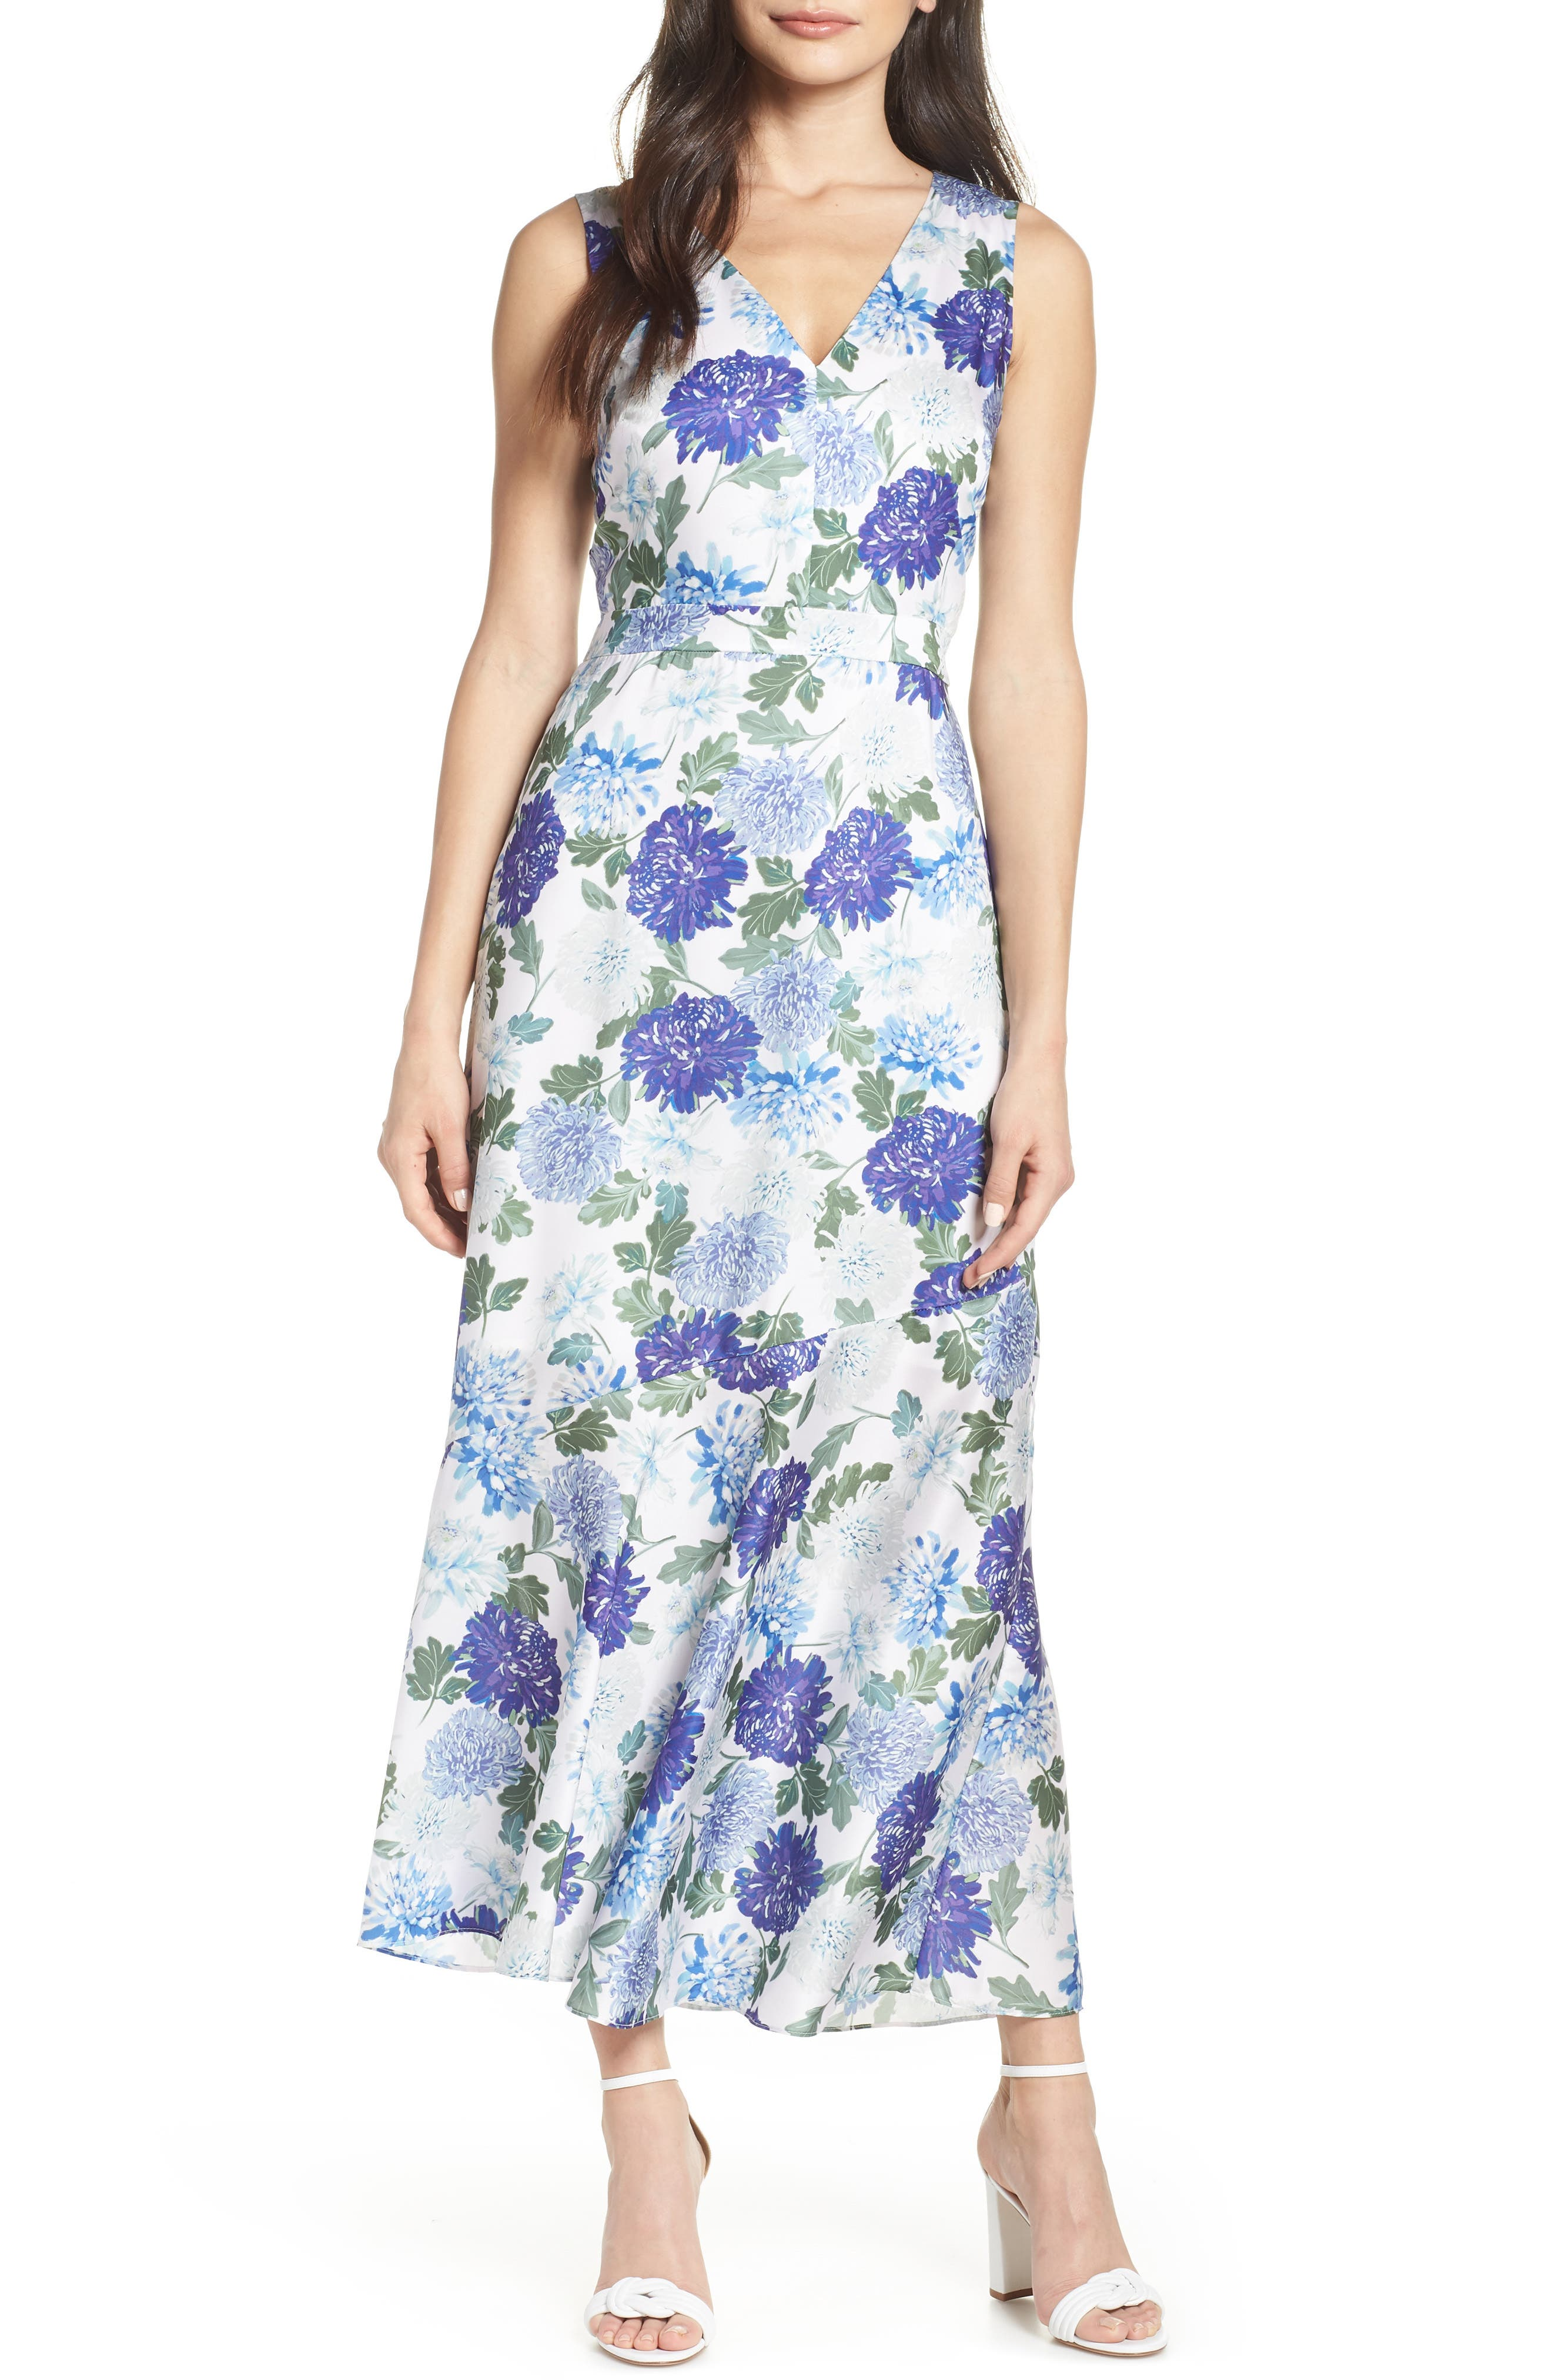 SAM EDELMAN, Vintage Floral Midi Dress, Main thumbnail 1, color, PURPLE MULTI